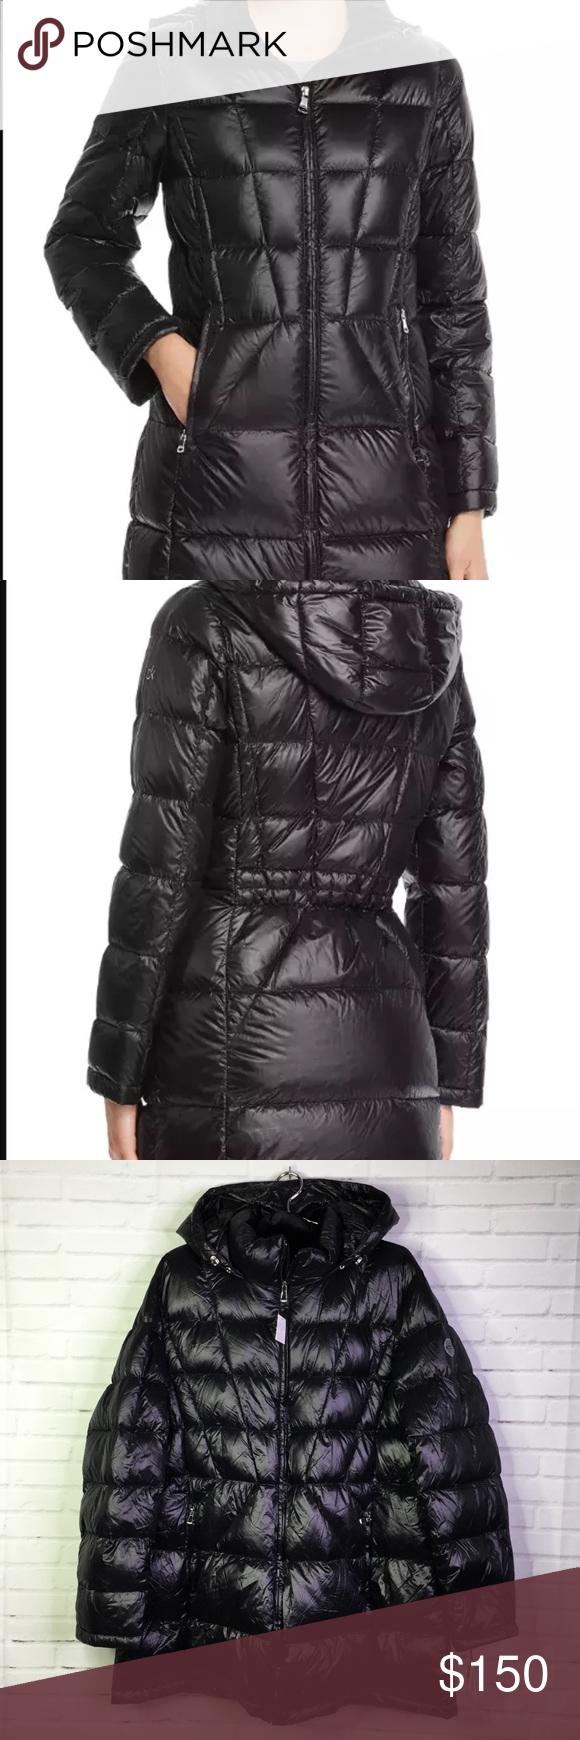 Calvin Klein Plus Size 2x Packable Puffer Jacket Calvin Klein Plus Size Clothes Design Jacket Brands [ 1740 x 580 Pixel ]